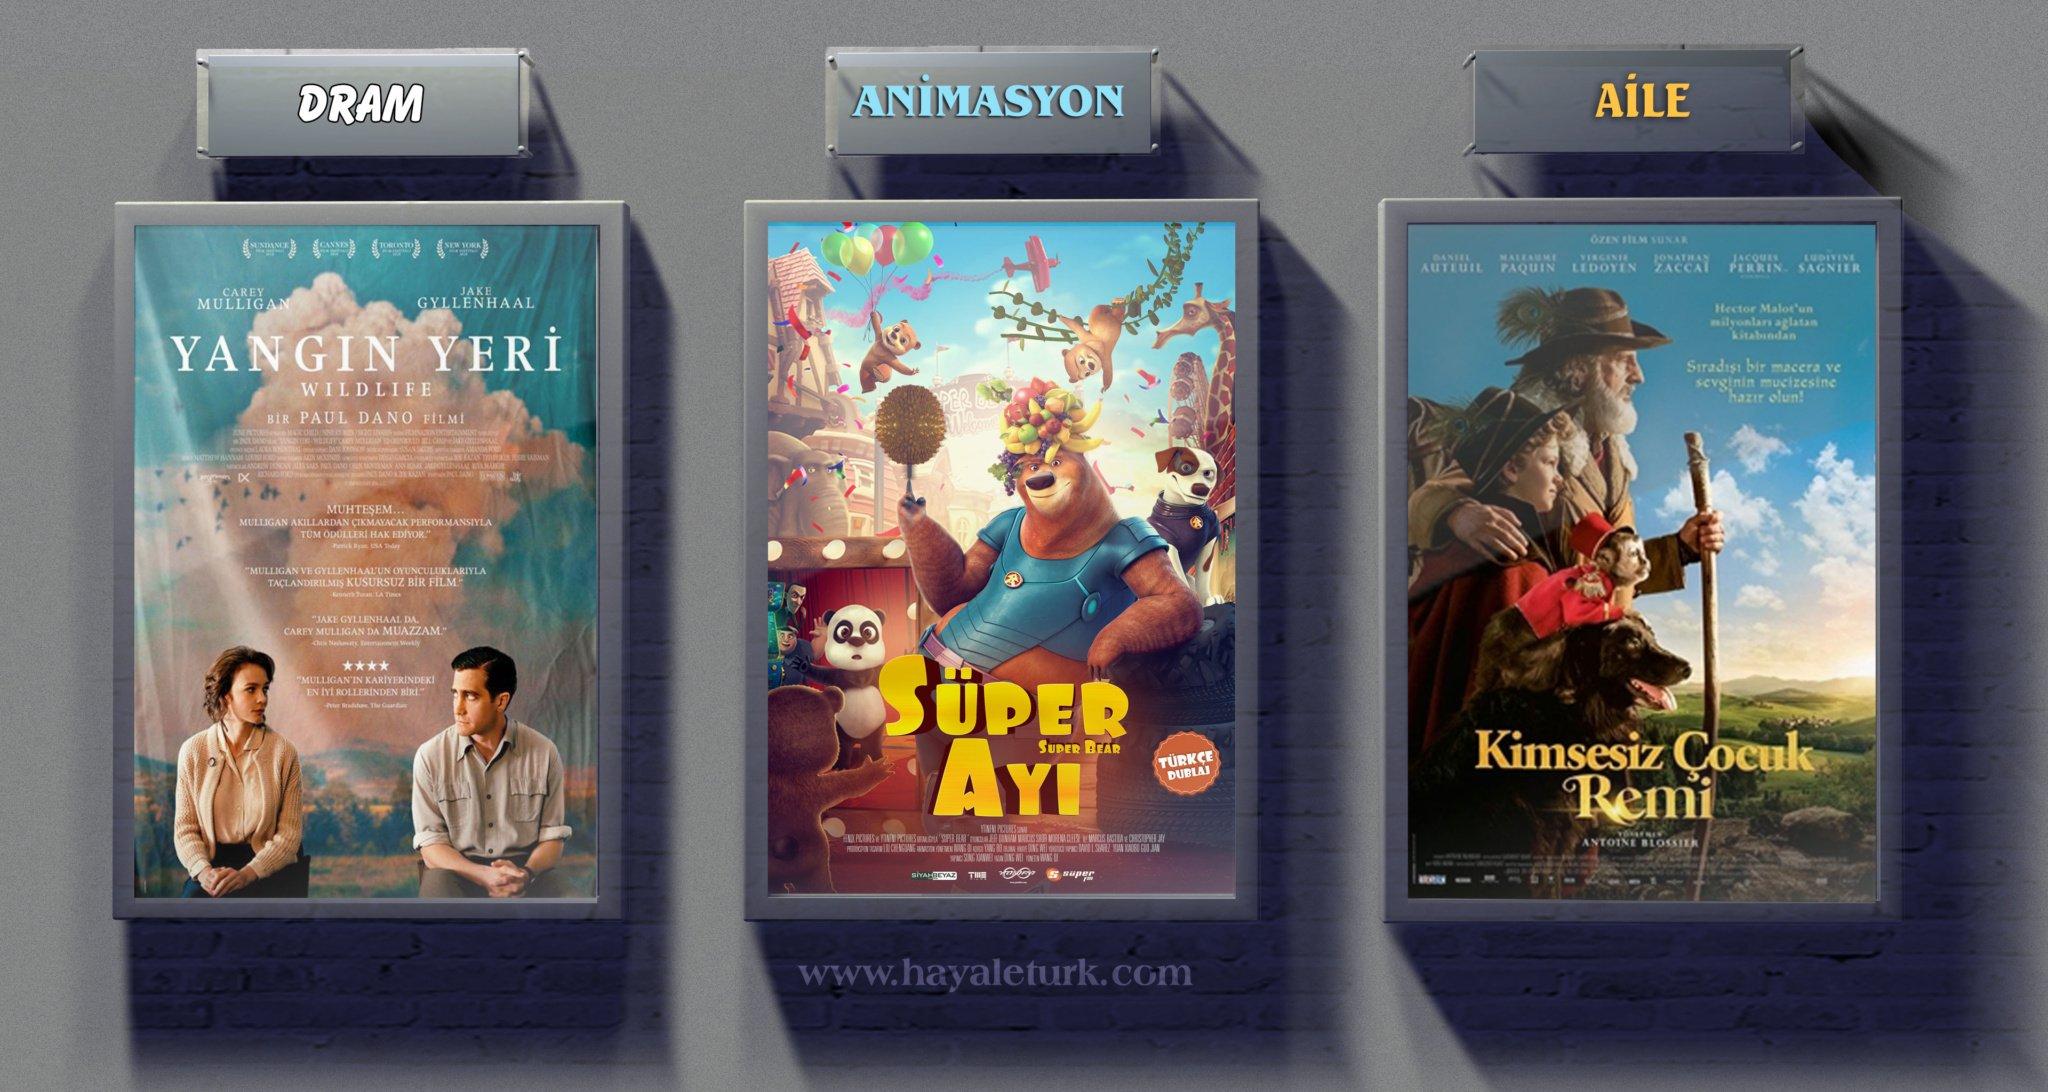 Sinemalarda bu hafta 8 Film vizyonda 4 - 11 Ocak 2019